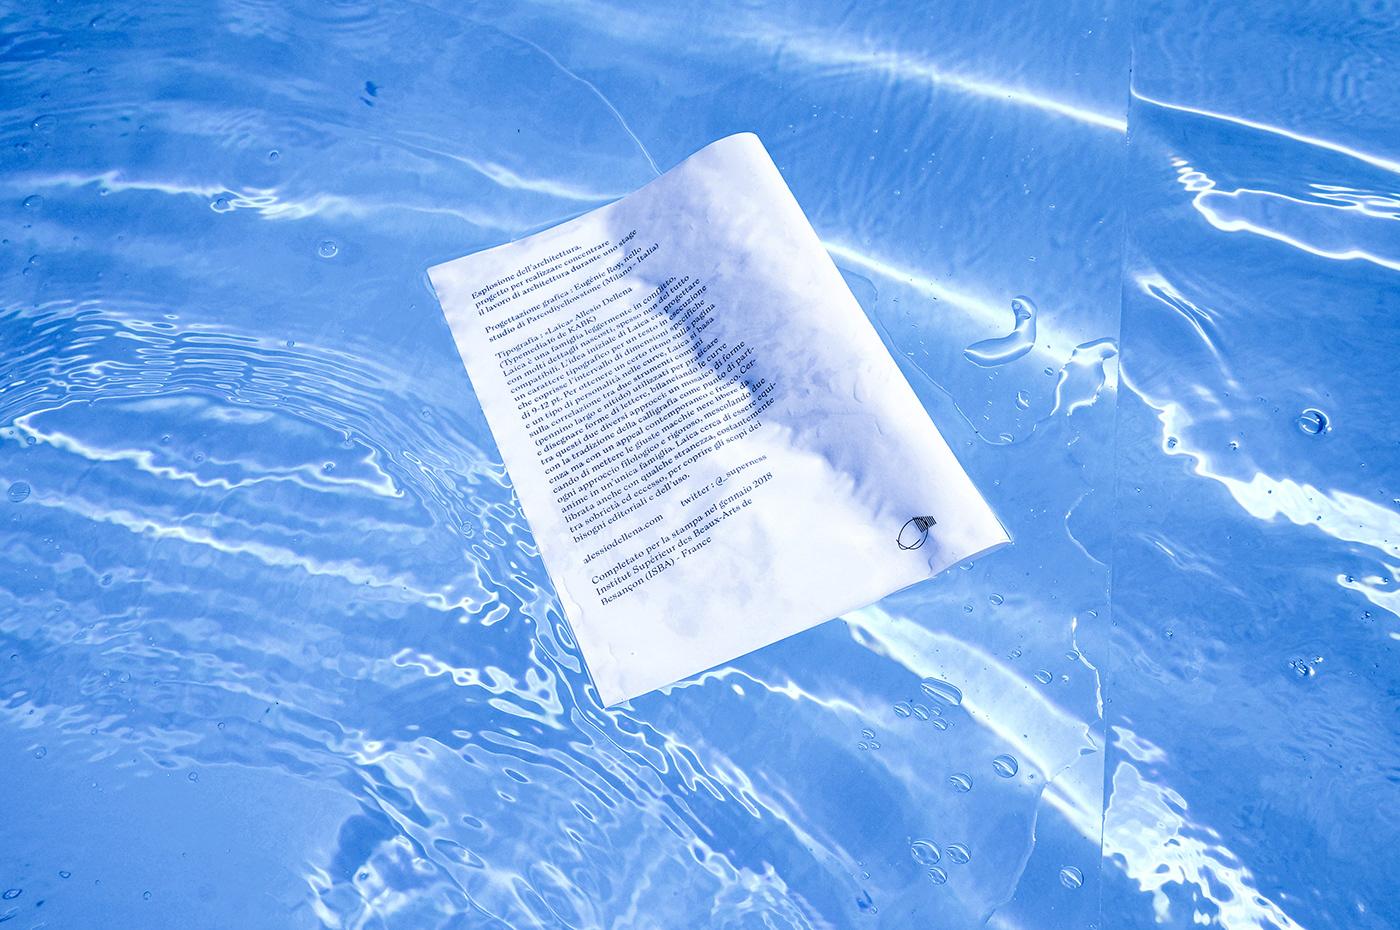 graphic design  edition publishing   mise en scène typefont architecture swimming pools art visuel Graphic Designer graphisme